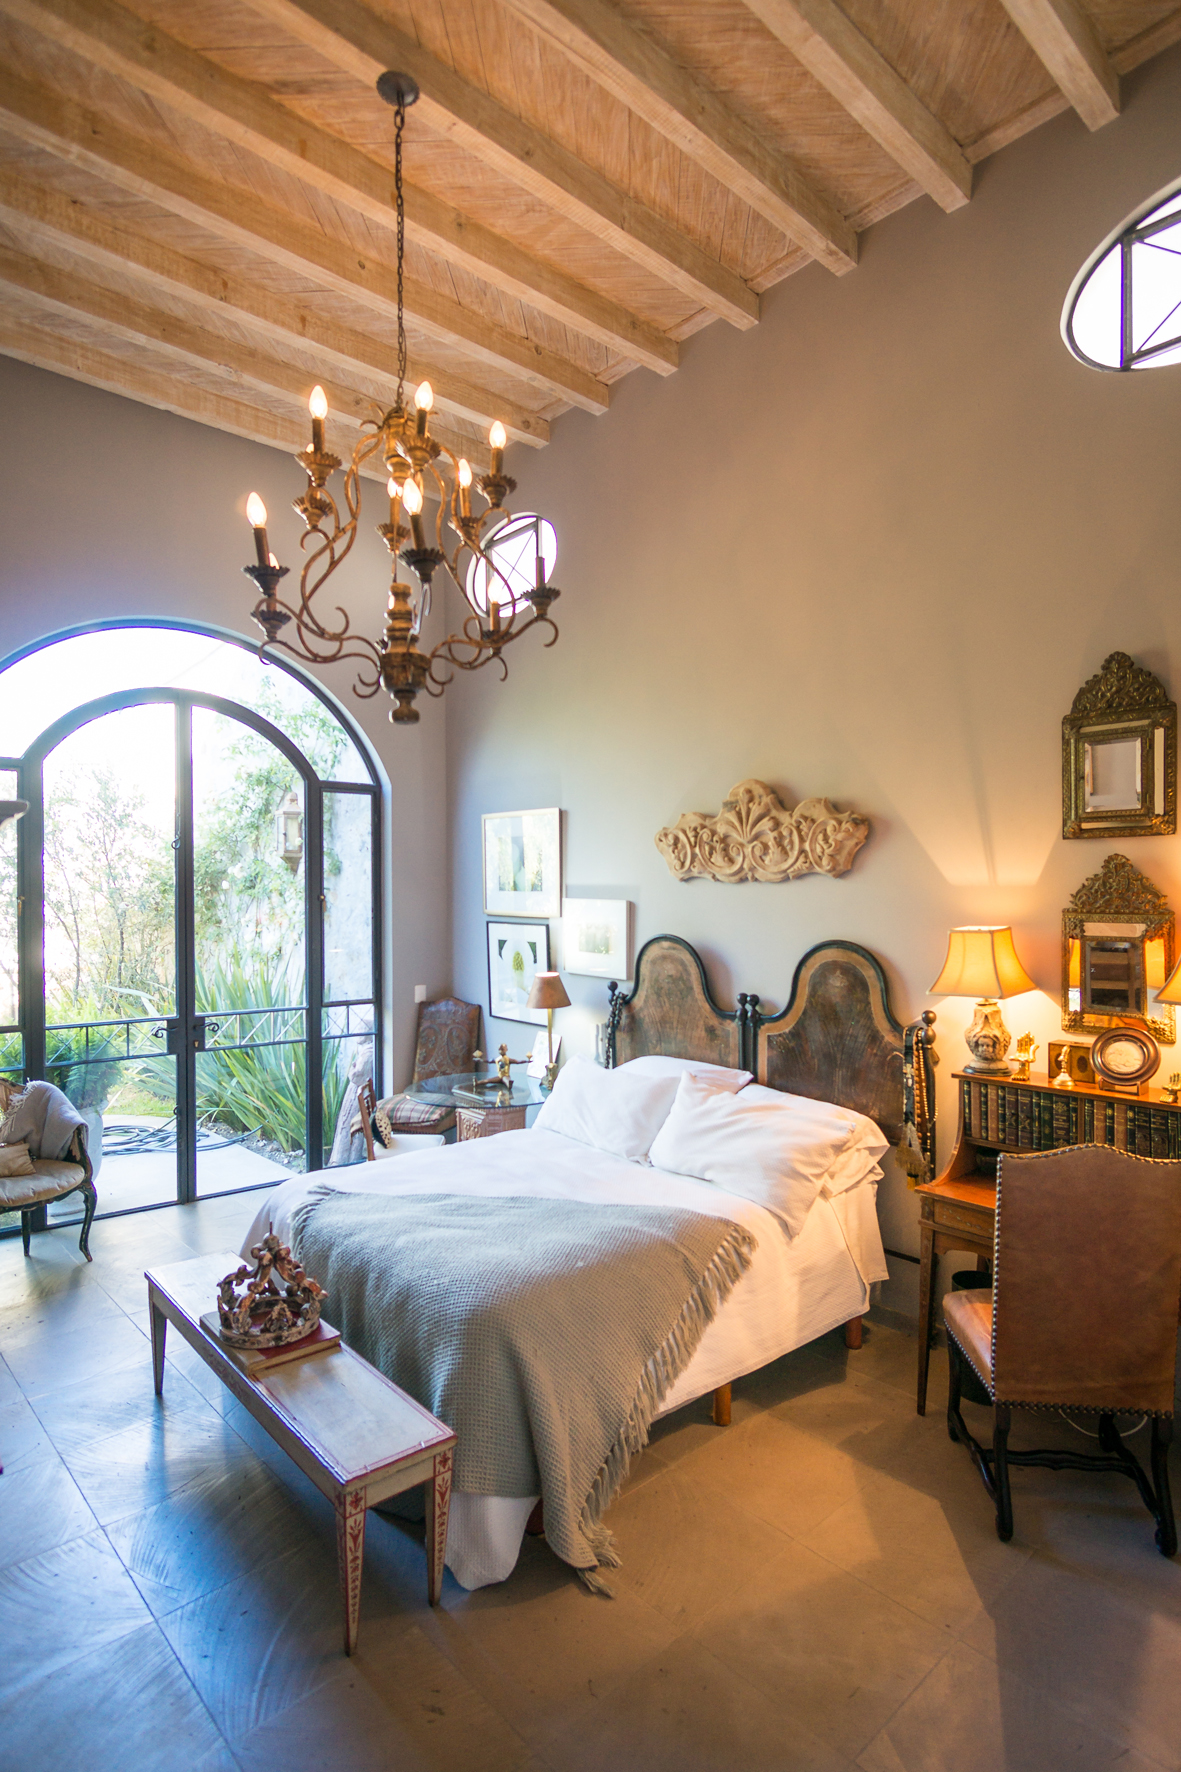 Additional photo for property listing at CASA DE LUZ Ojo De Agua, San Miguel De Allende, Guanajuato México